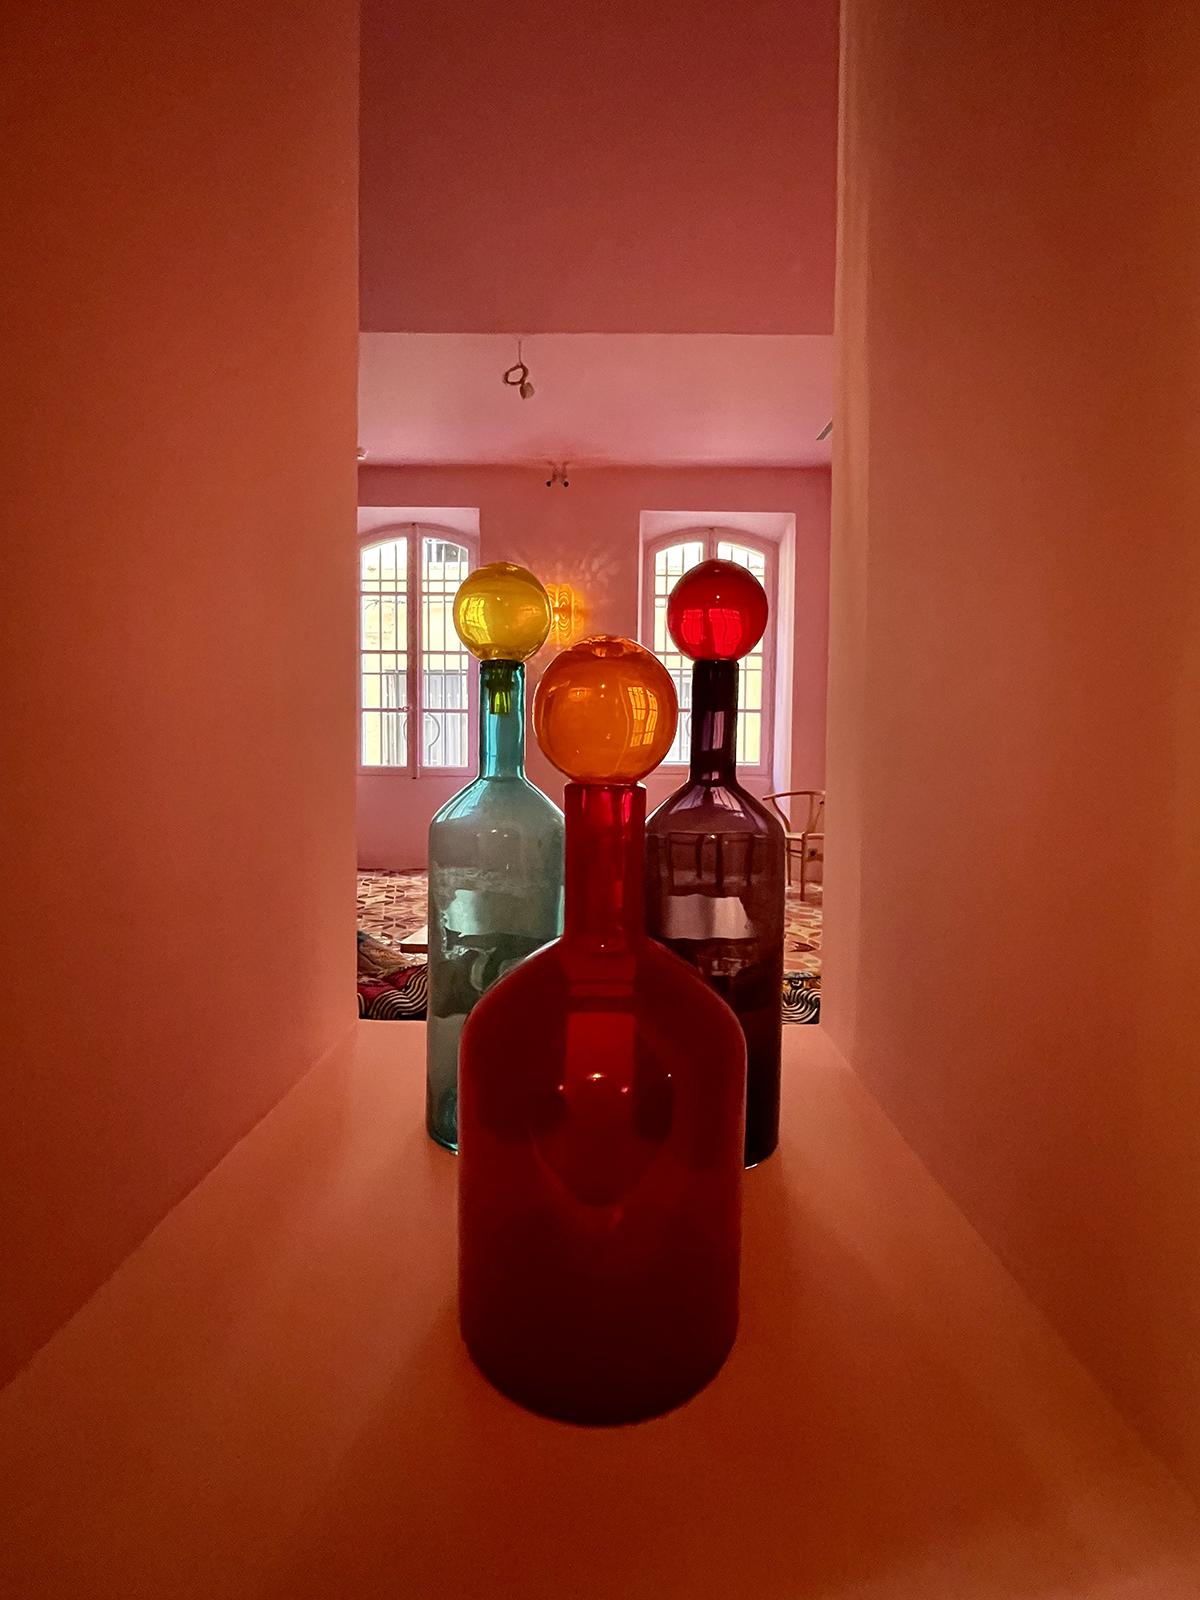 colourful glass bottles